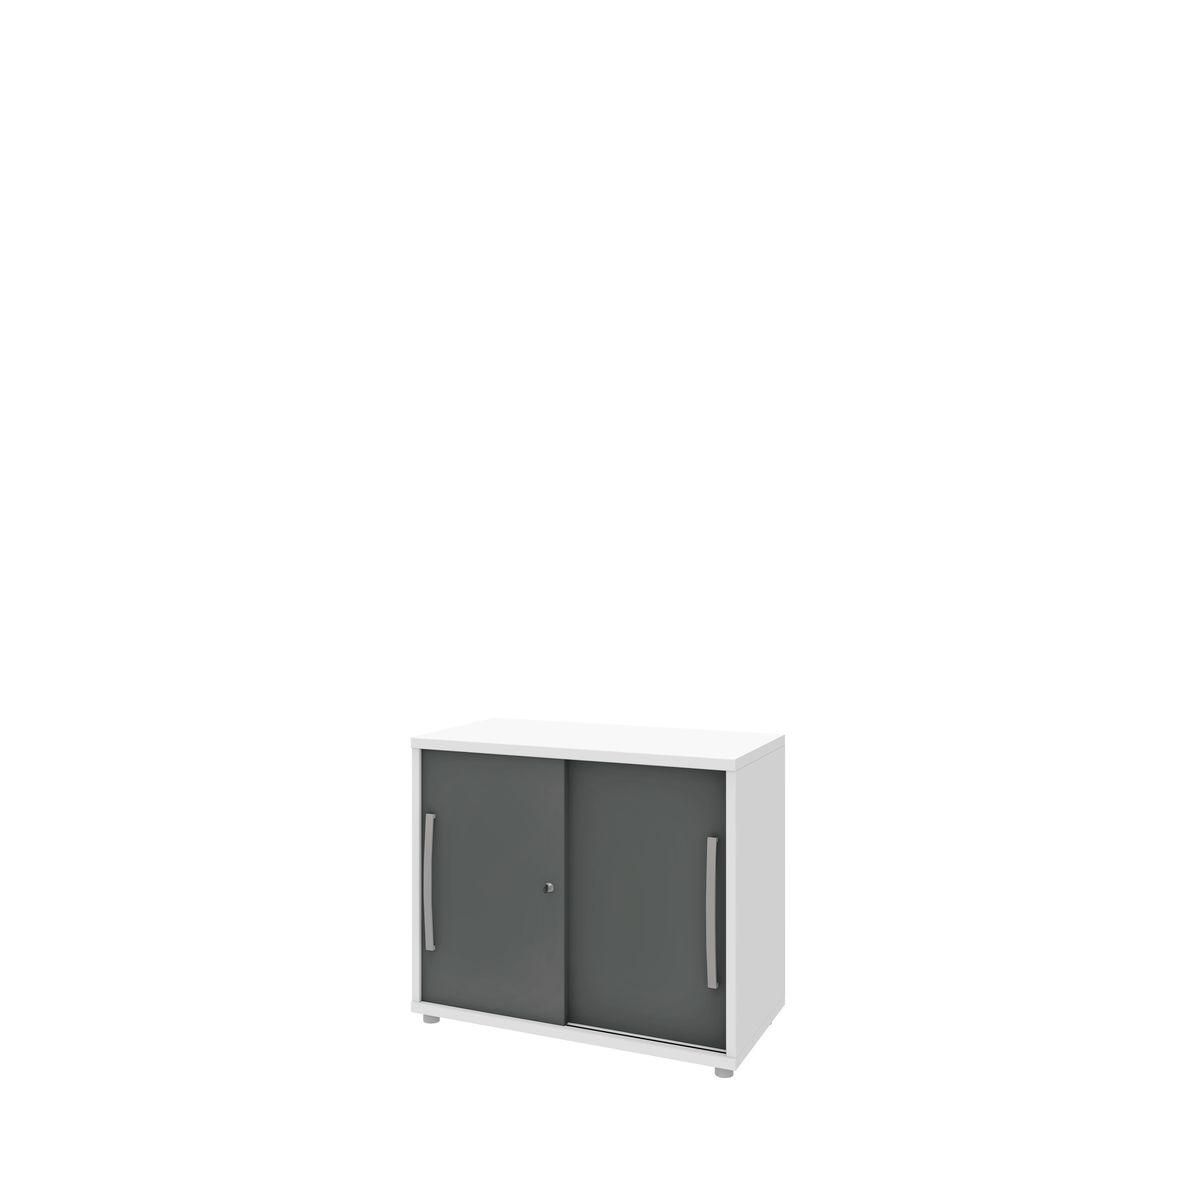 schiebet ren schrank bari anstellbar an c fu freiformtisch 1 boden schloss b 800 mm g nstig. Black Bedroom Furniture Sets. Home Design Ideas